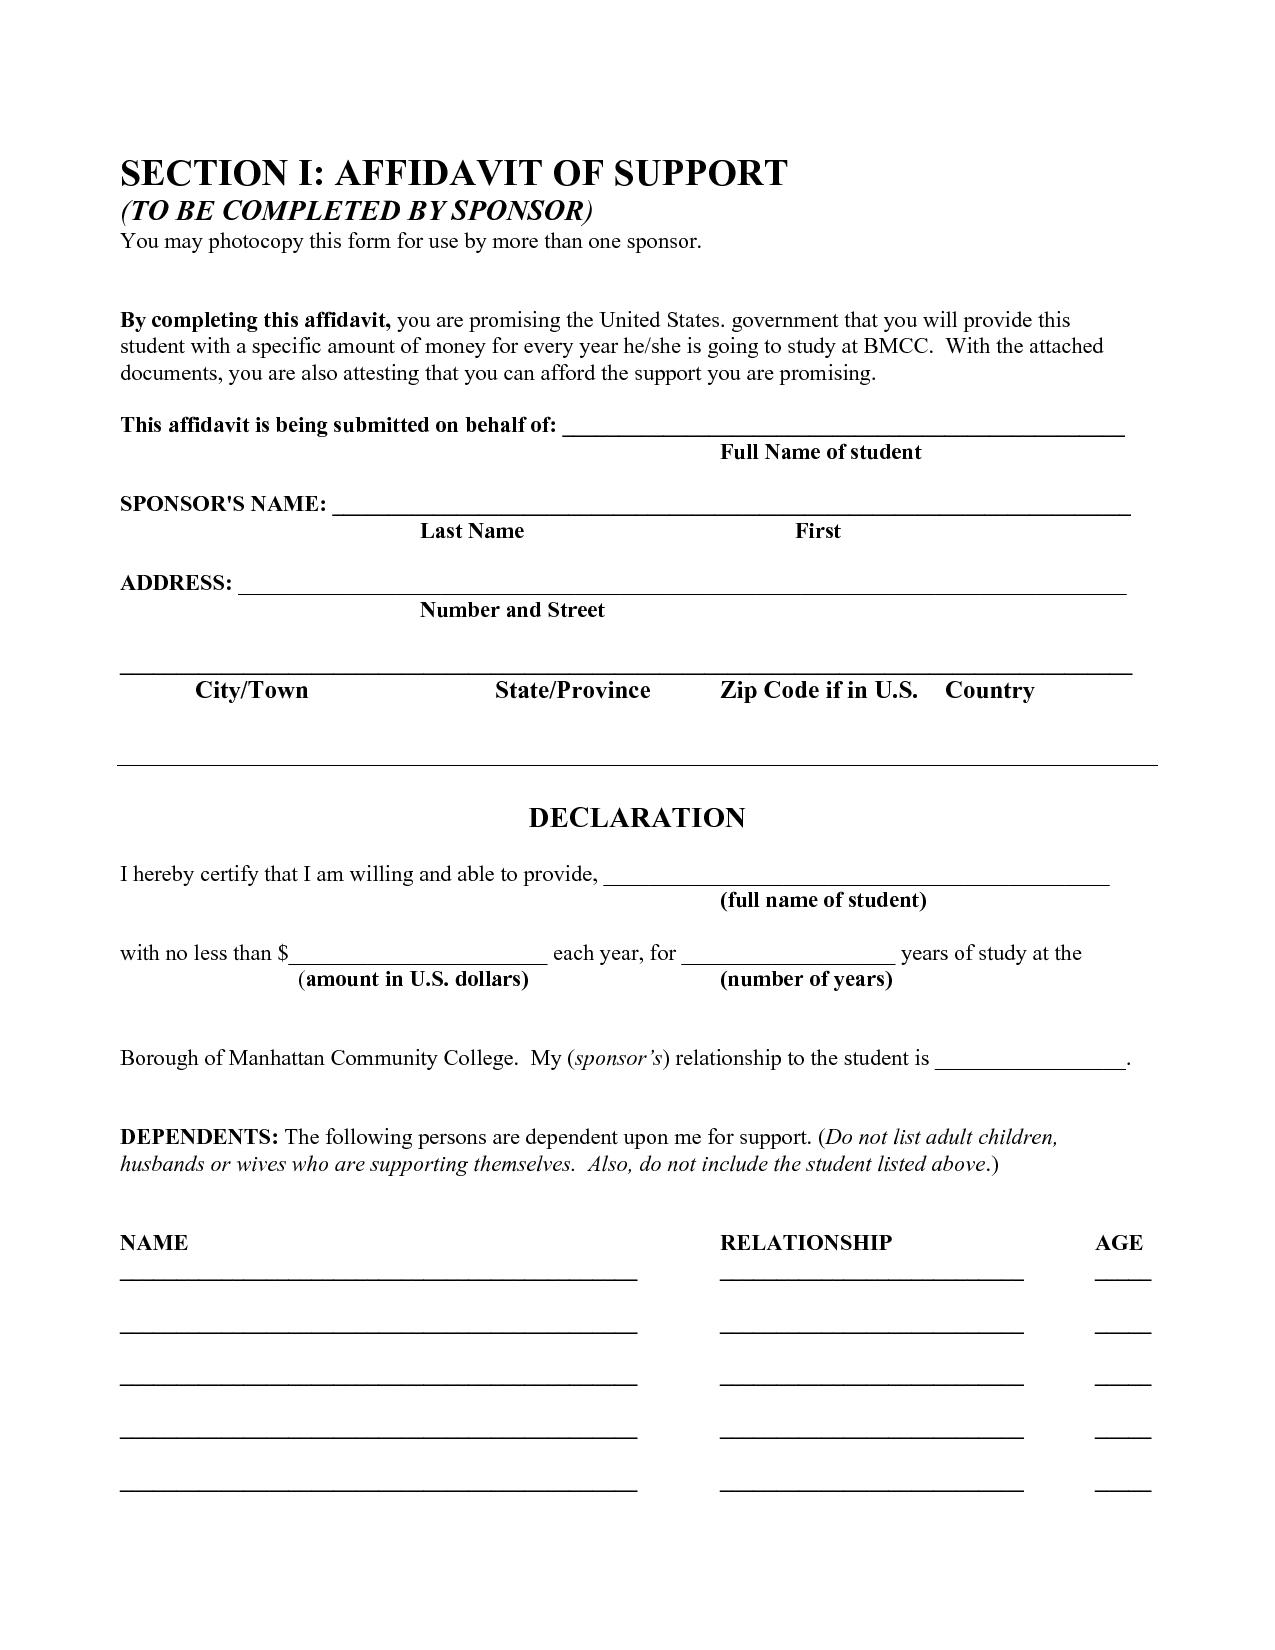 Free Affidavit Formbeunaventuralongjas - Affidavit Templates - Free Printable Legal Documents Forms